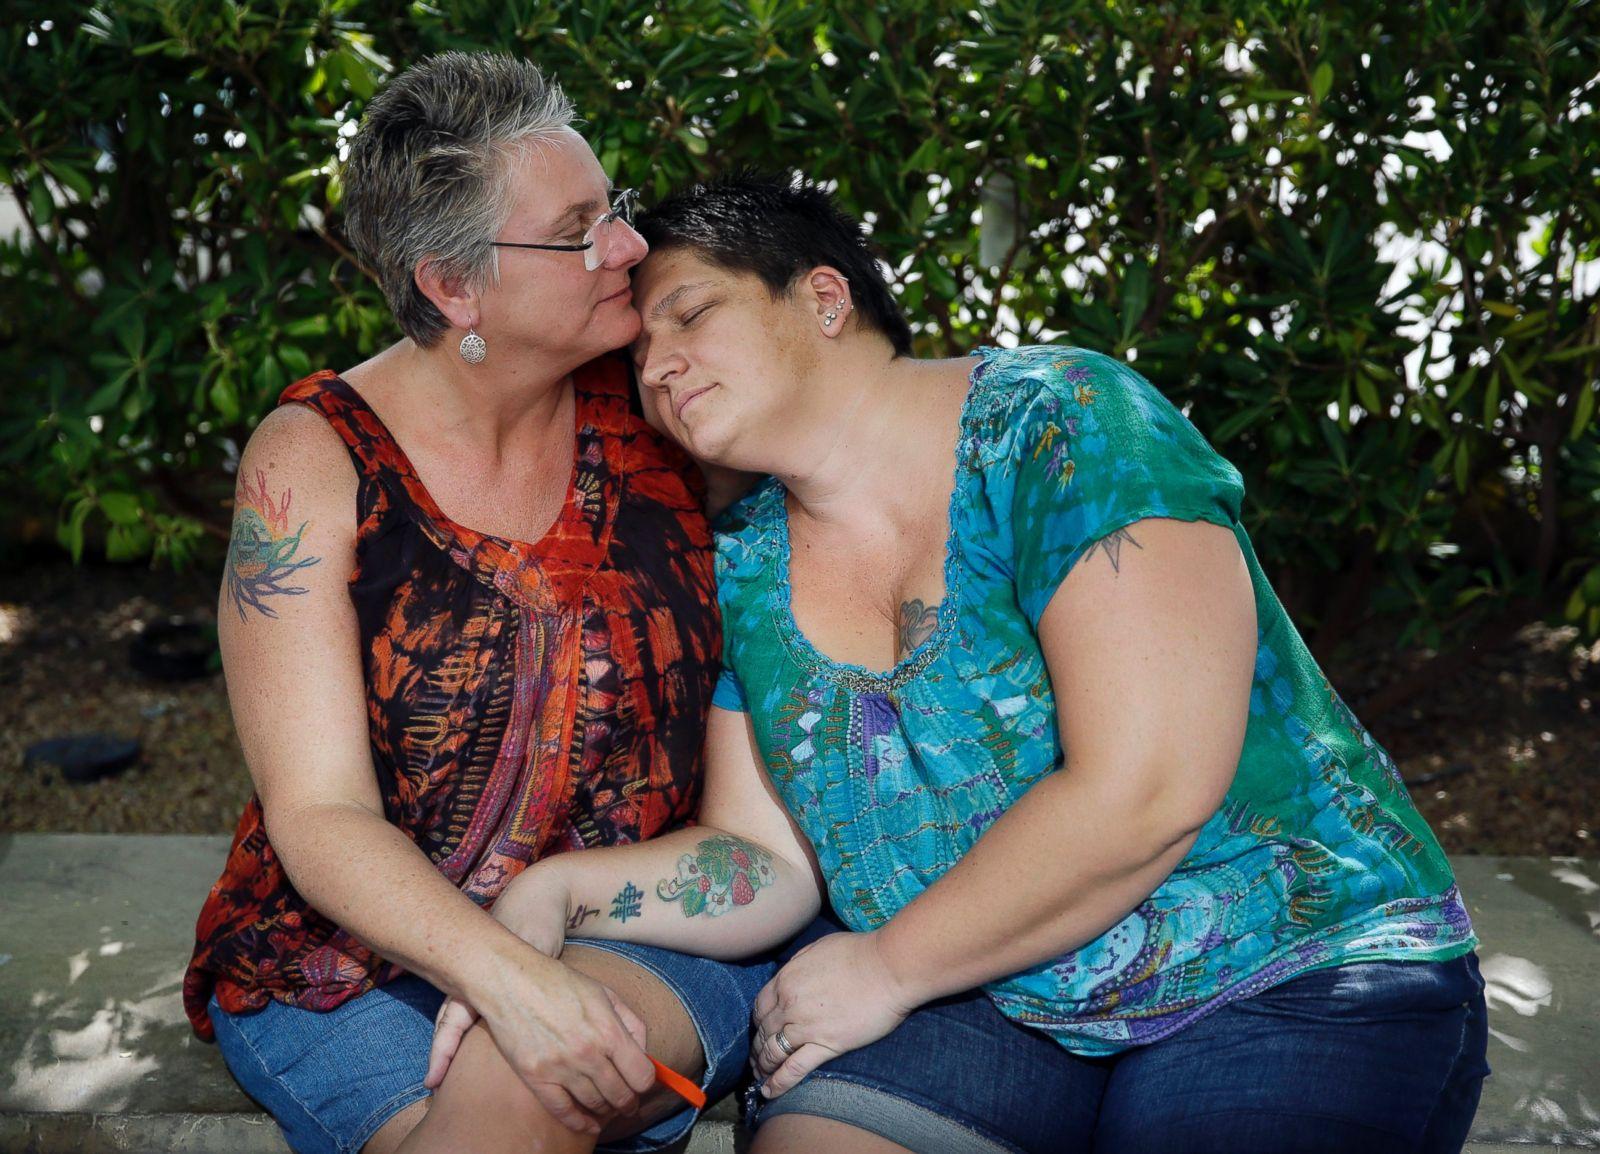 Guns To Gay Marriage